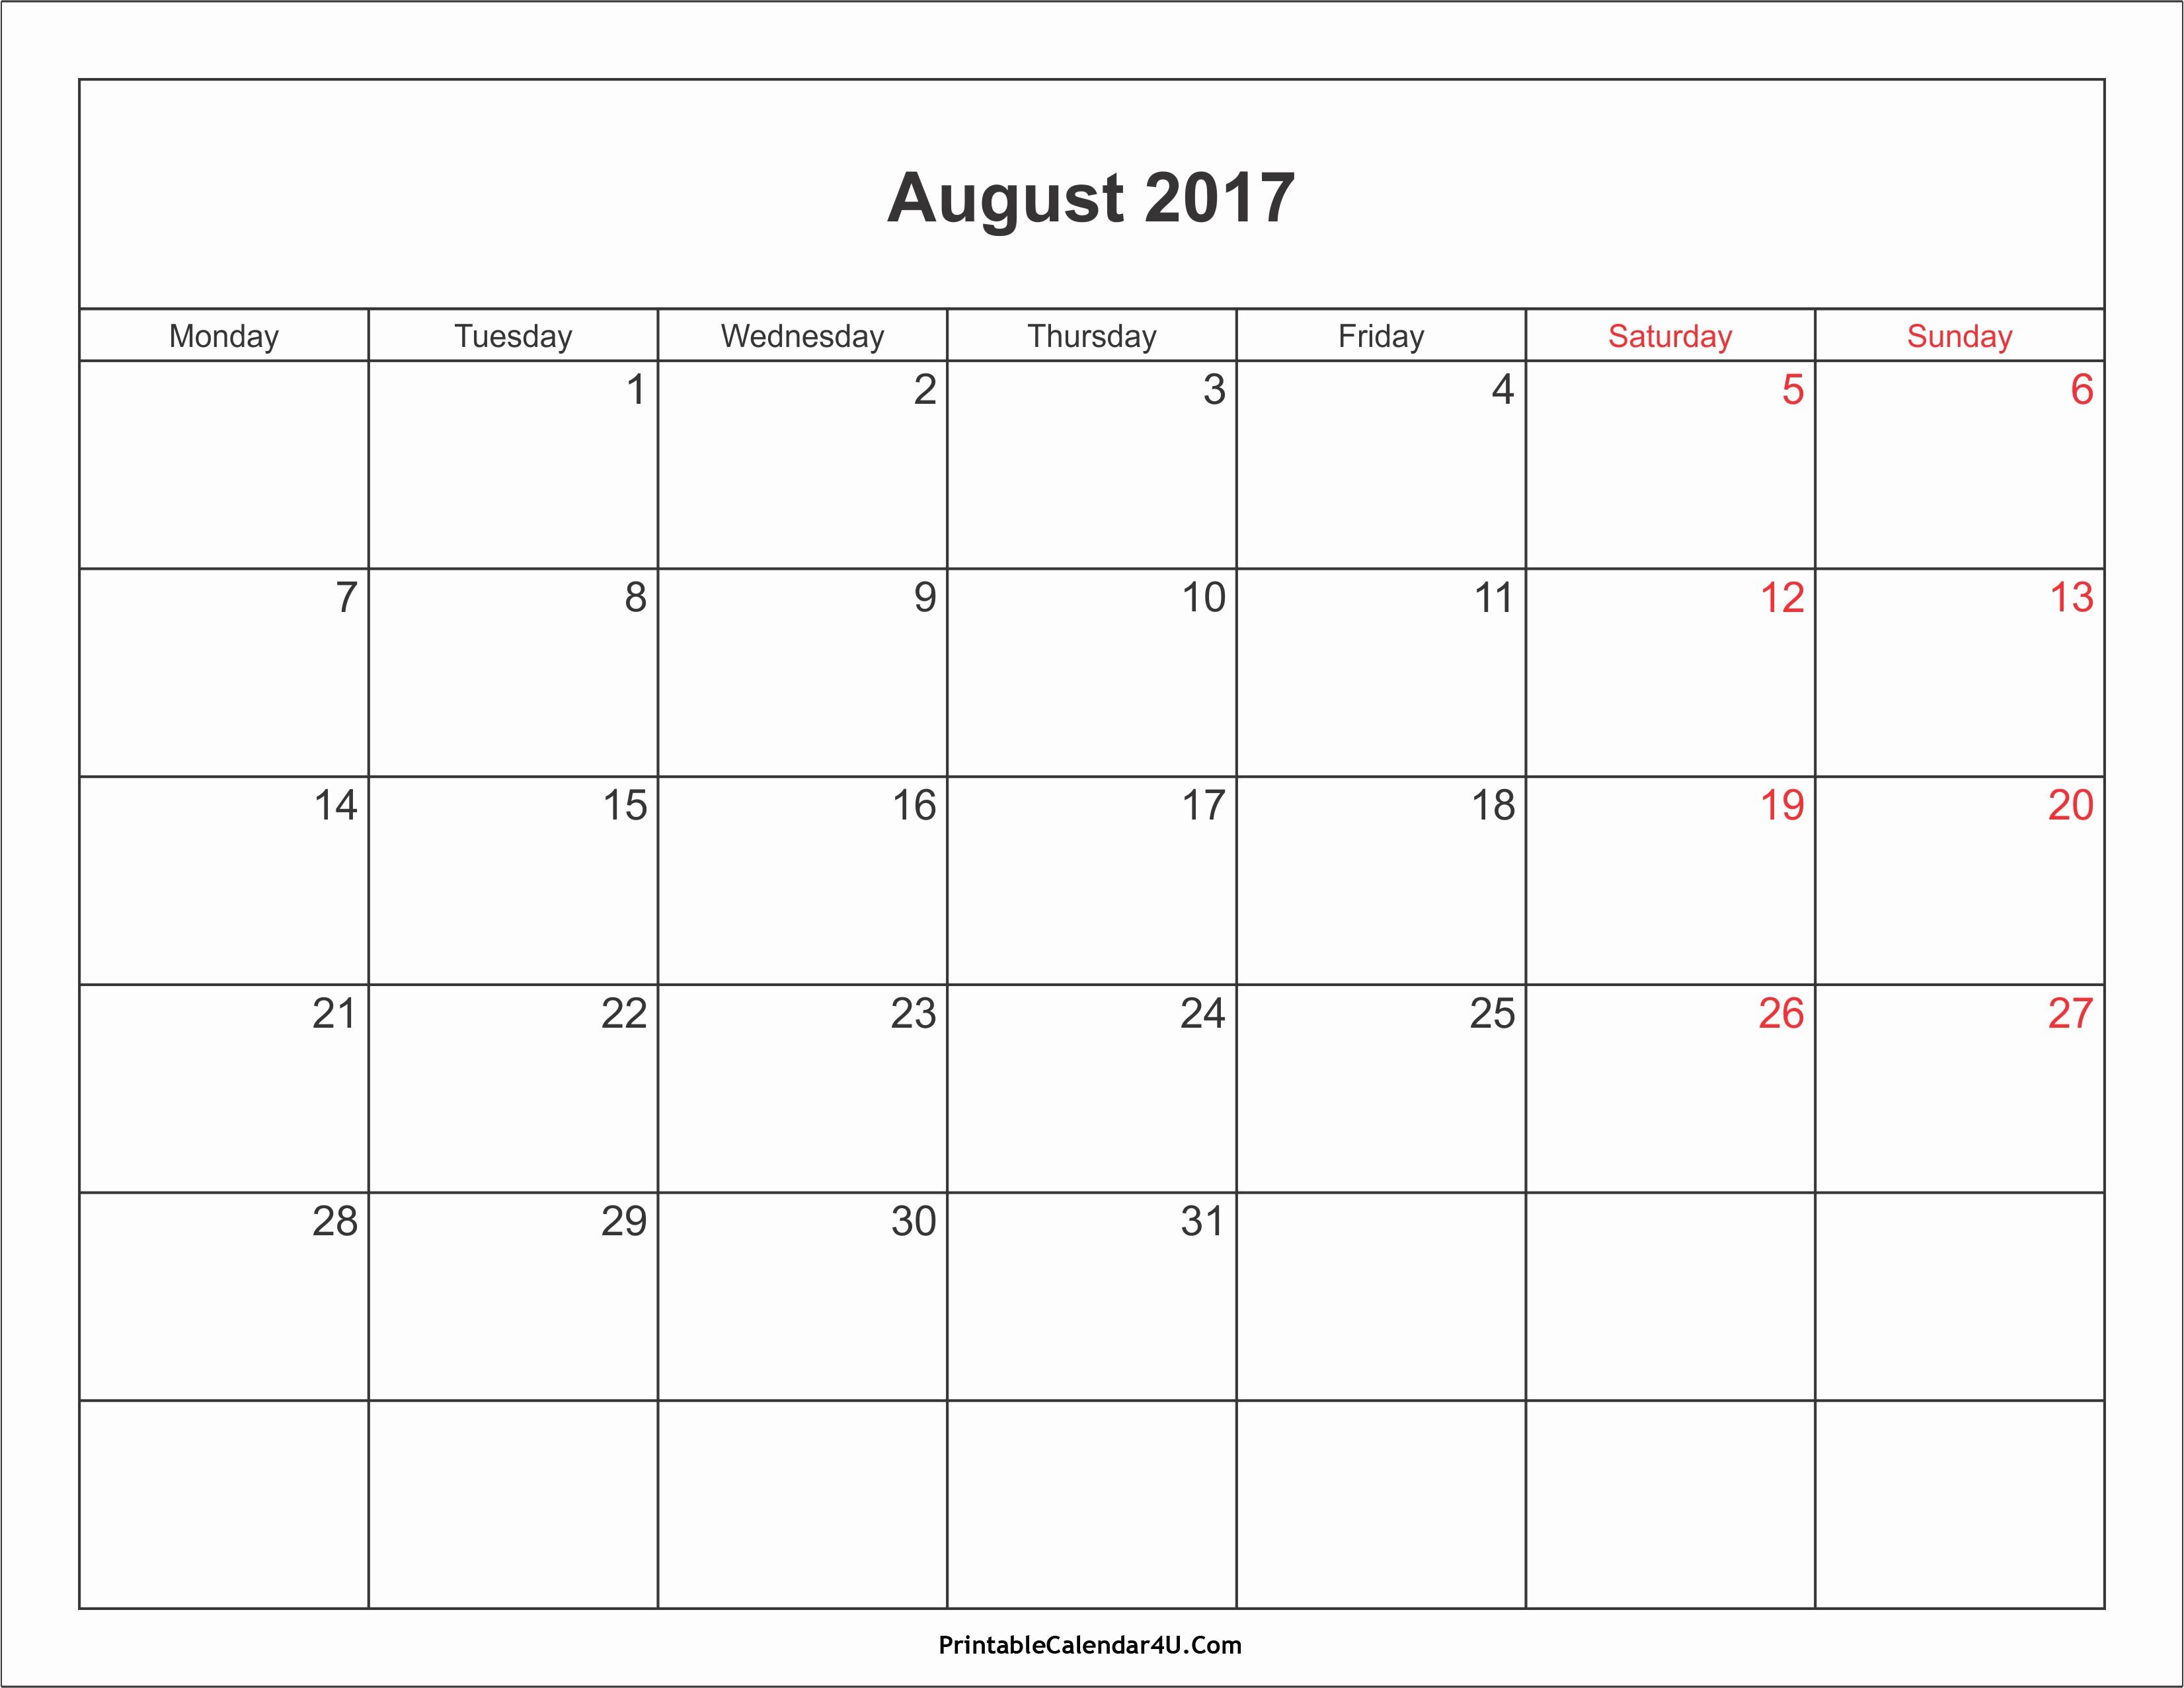 Blank Calendar Template August 2017 New August 2017 Calendar with Holidays